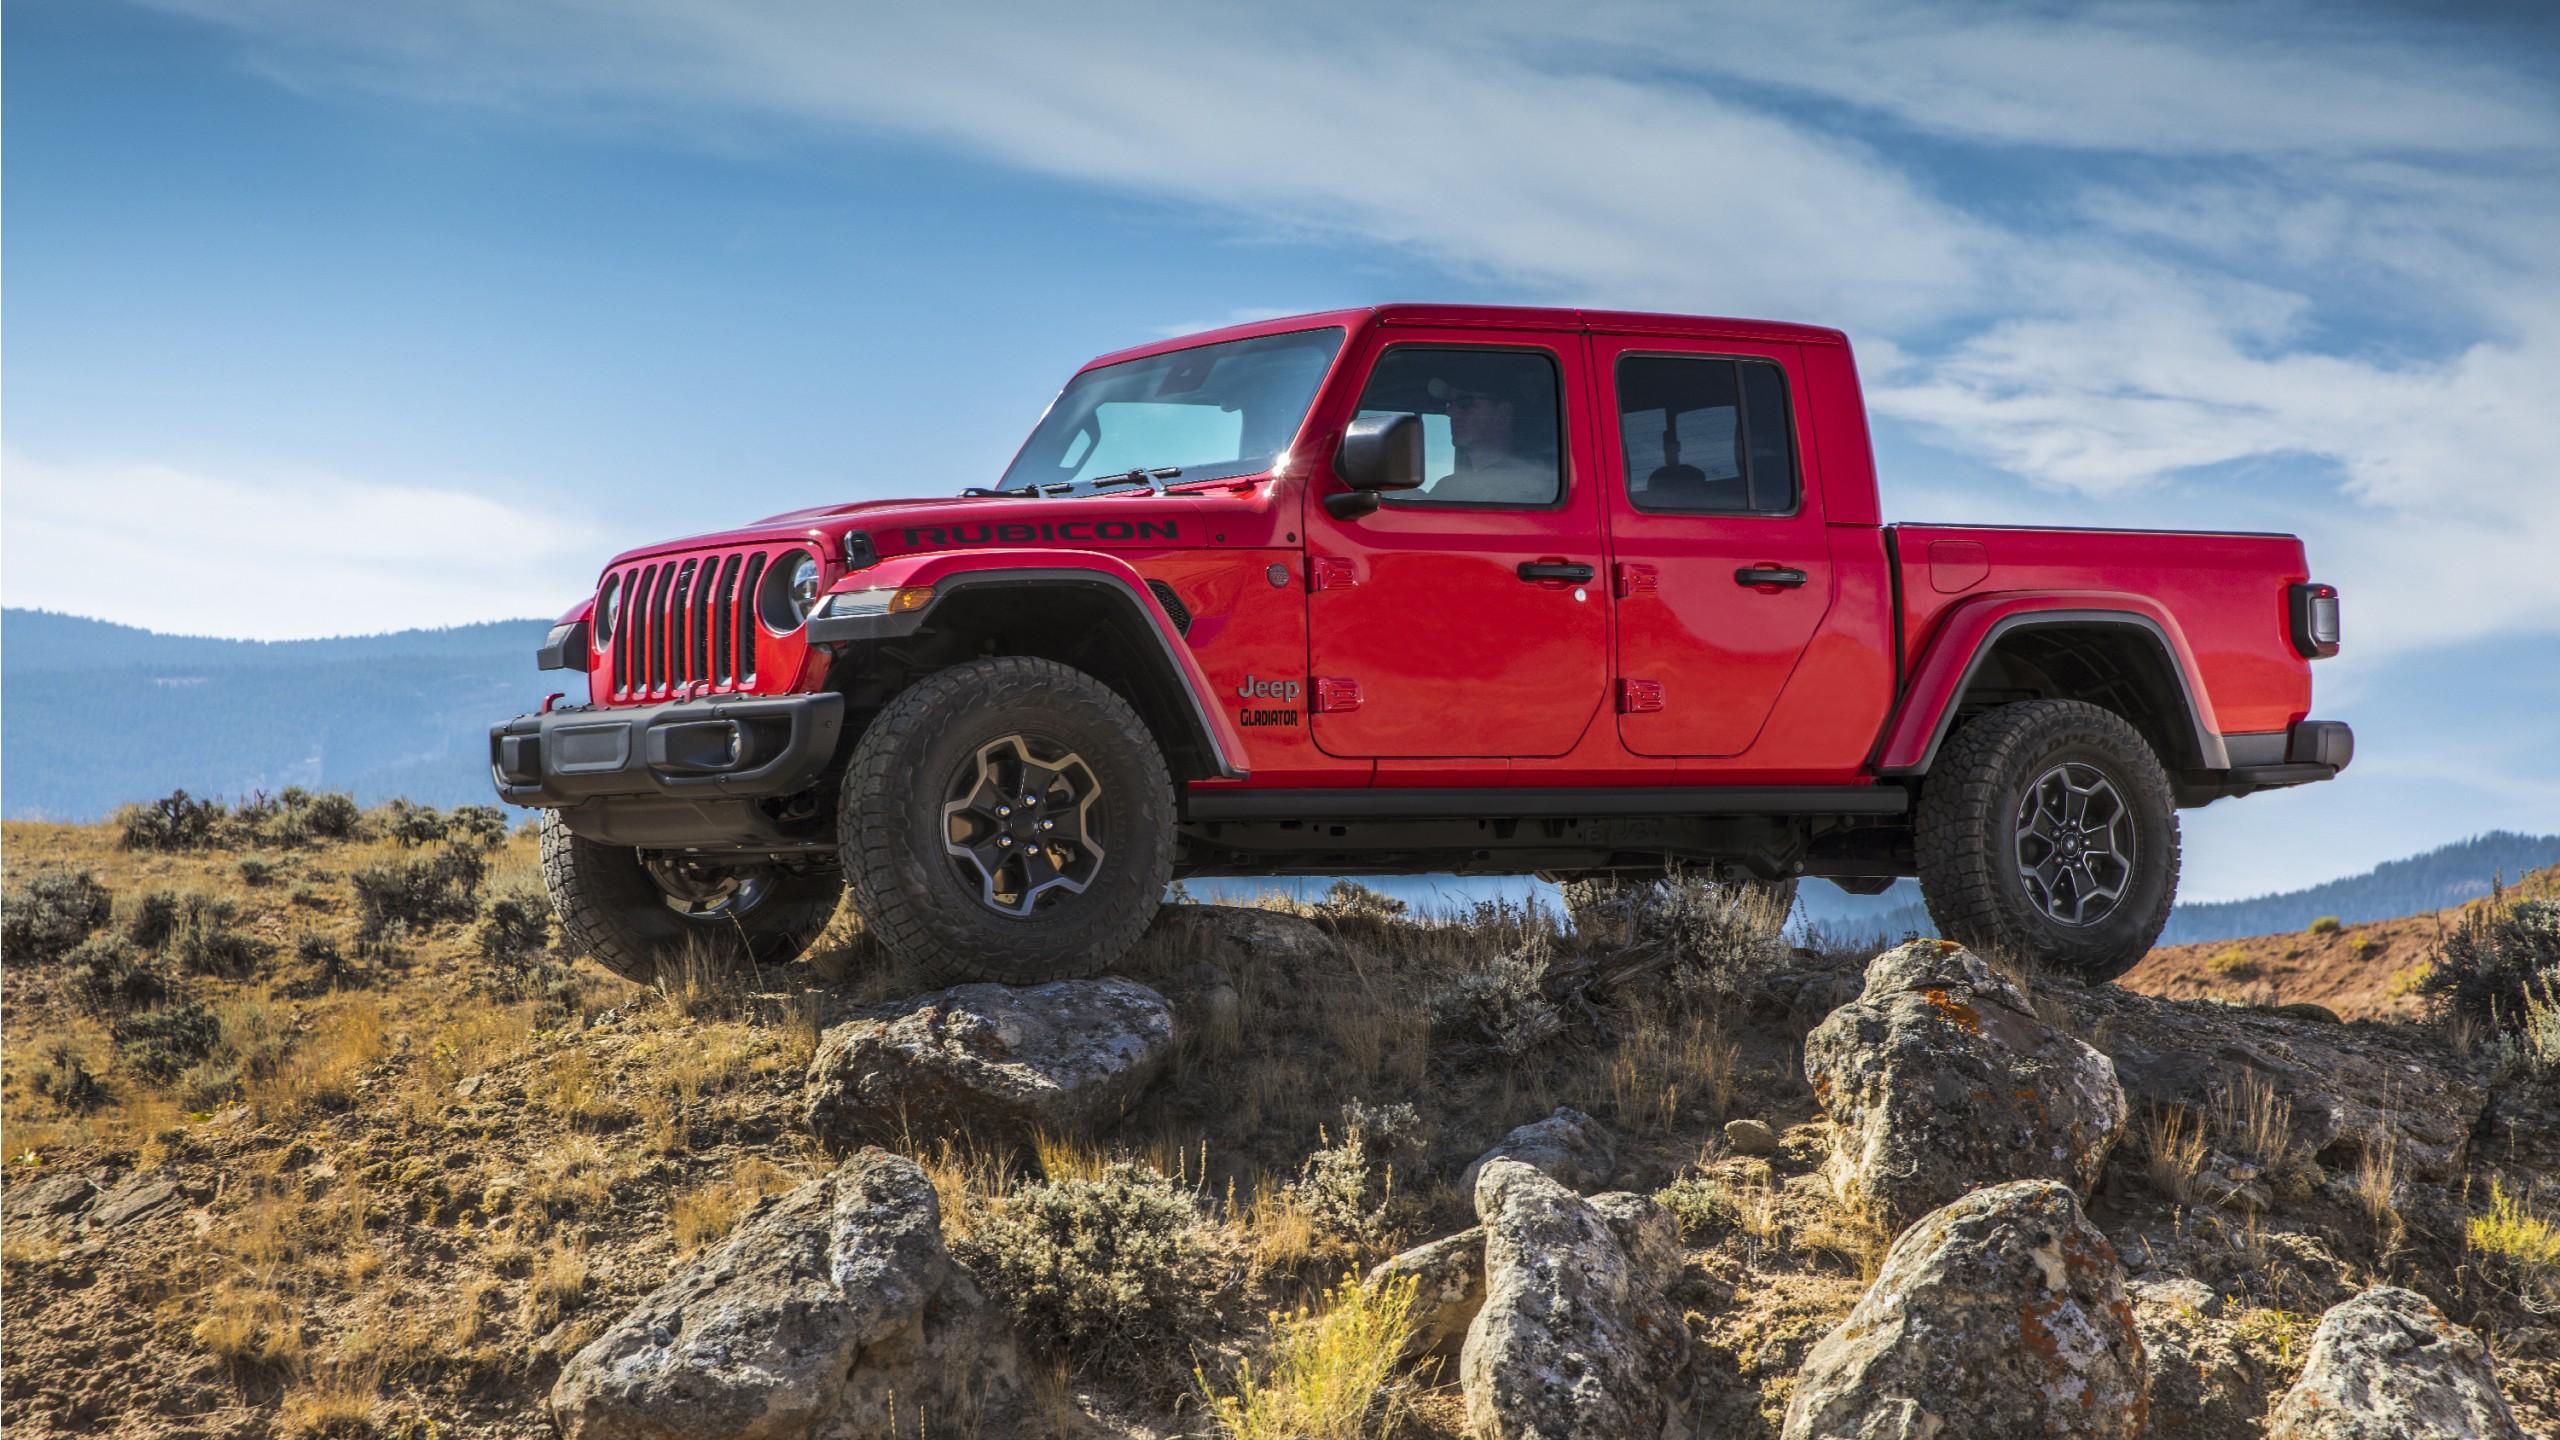 2020 Jeep Gladiator Rubicon Wallpaper   HD Car Wallpapers ...